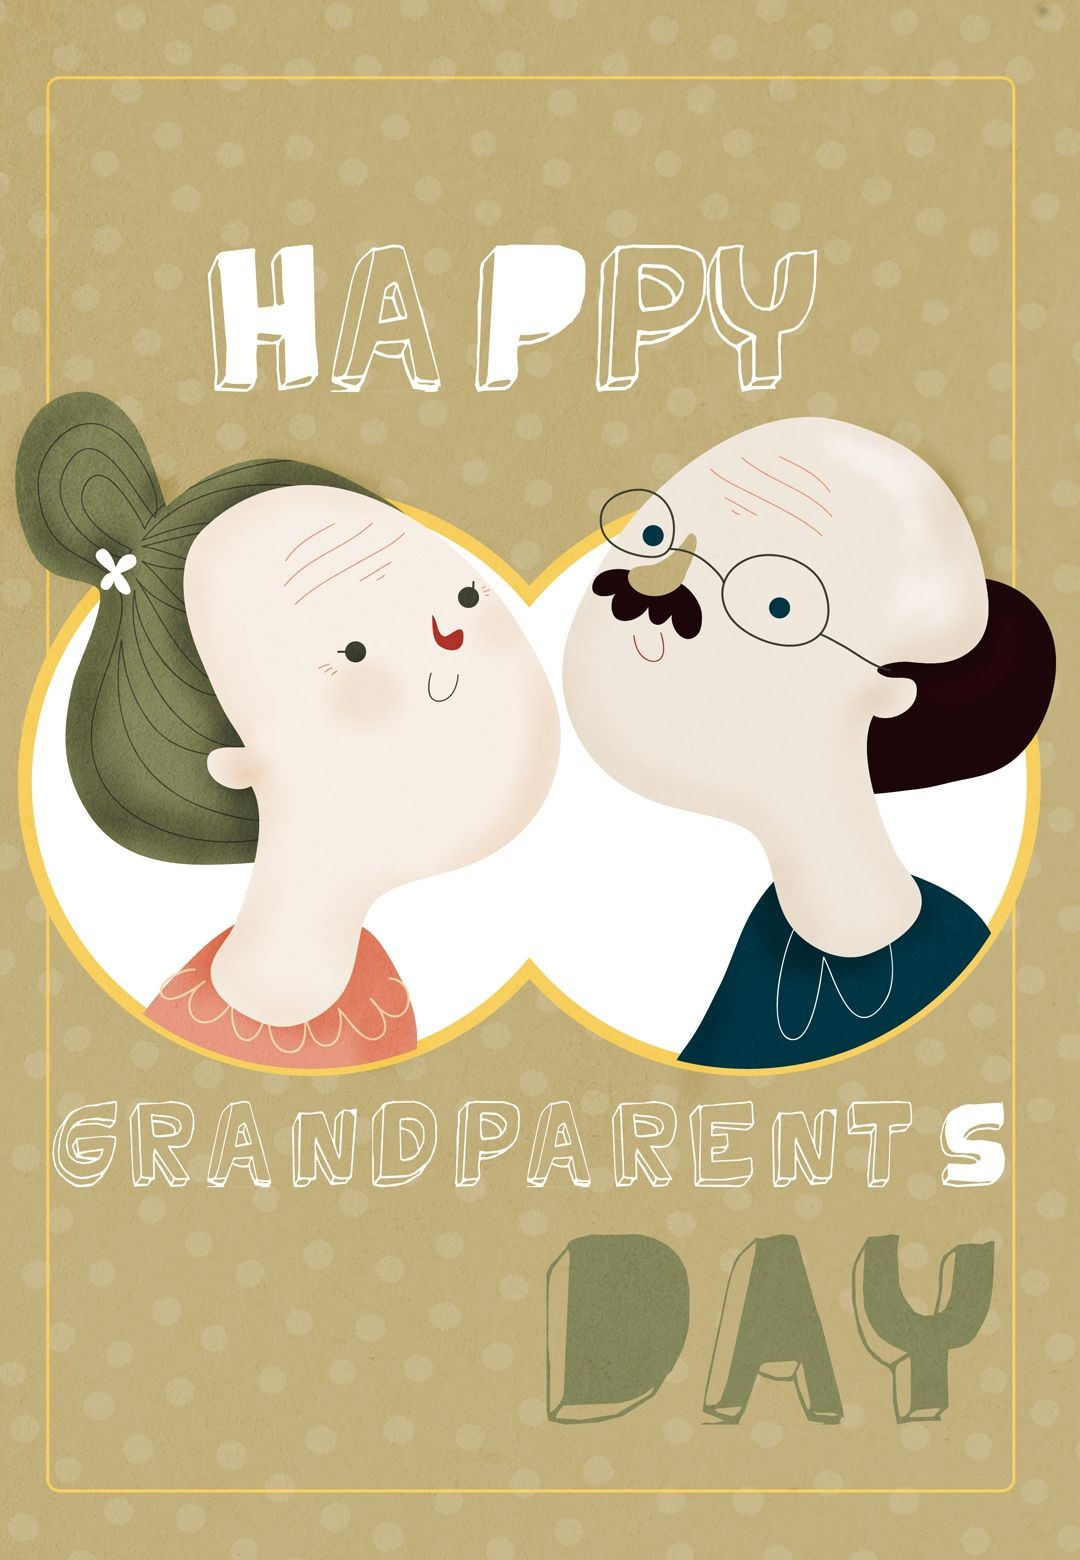 Free Printable Happy Grandparents Day Greeting Card | Grandparents - Free Printable Easter Cards For Grandchildren